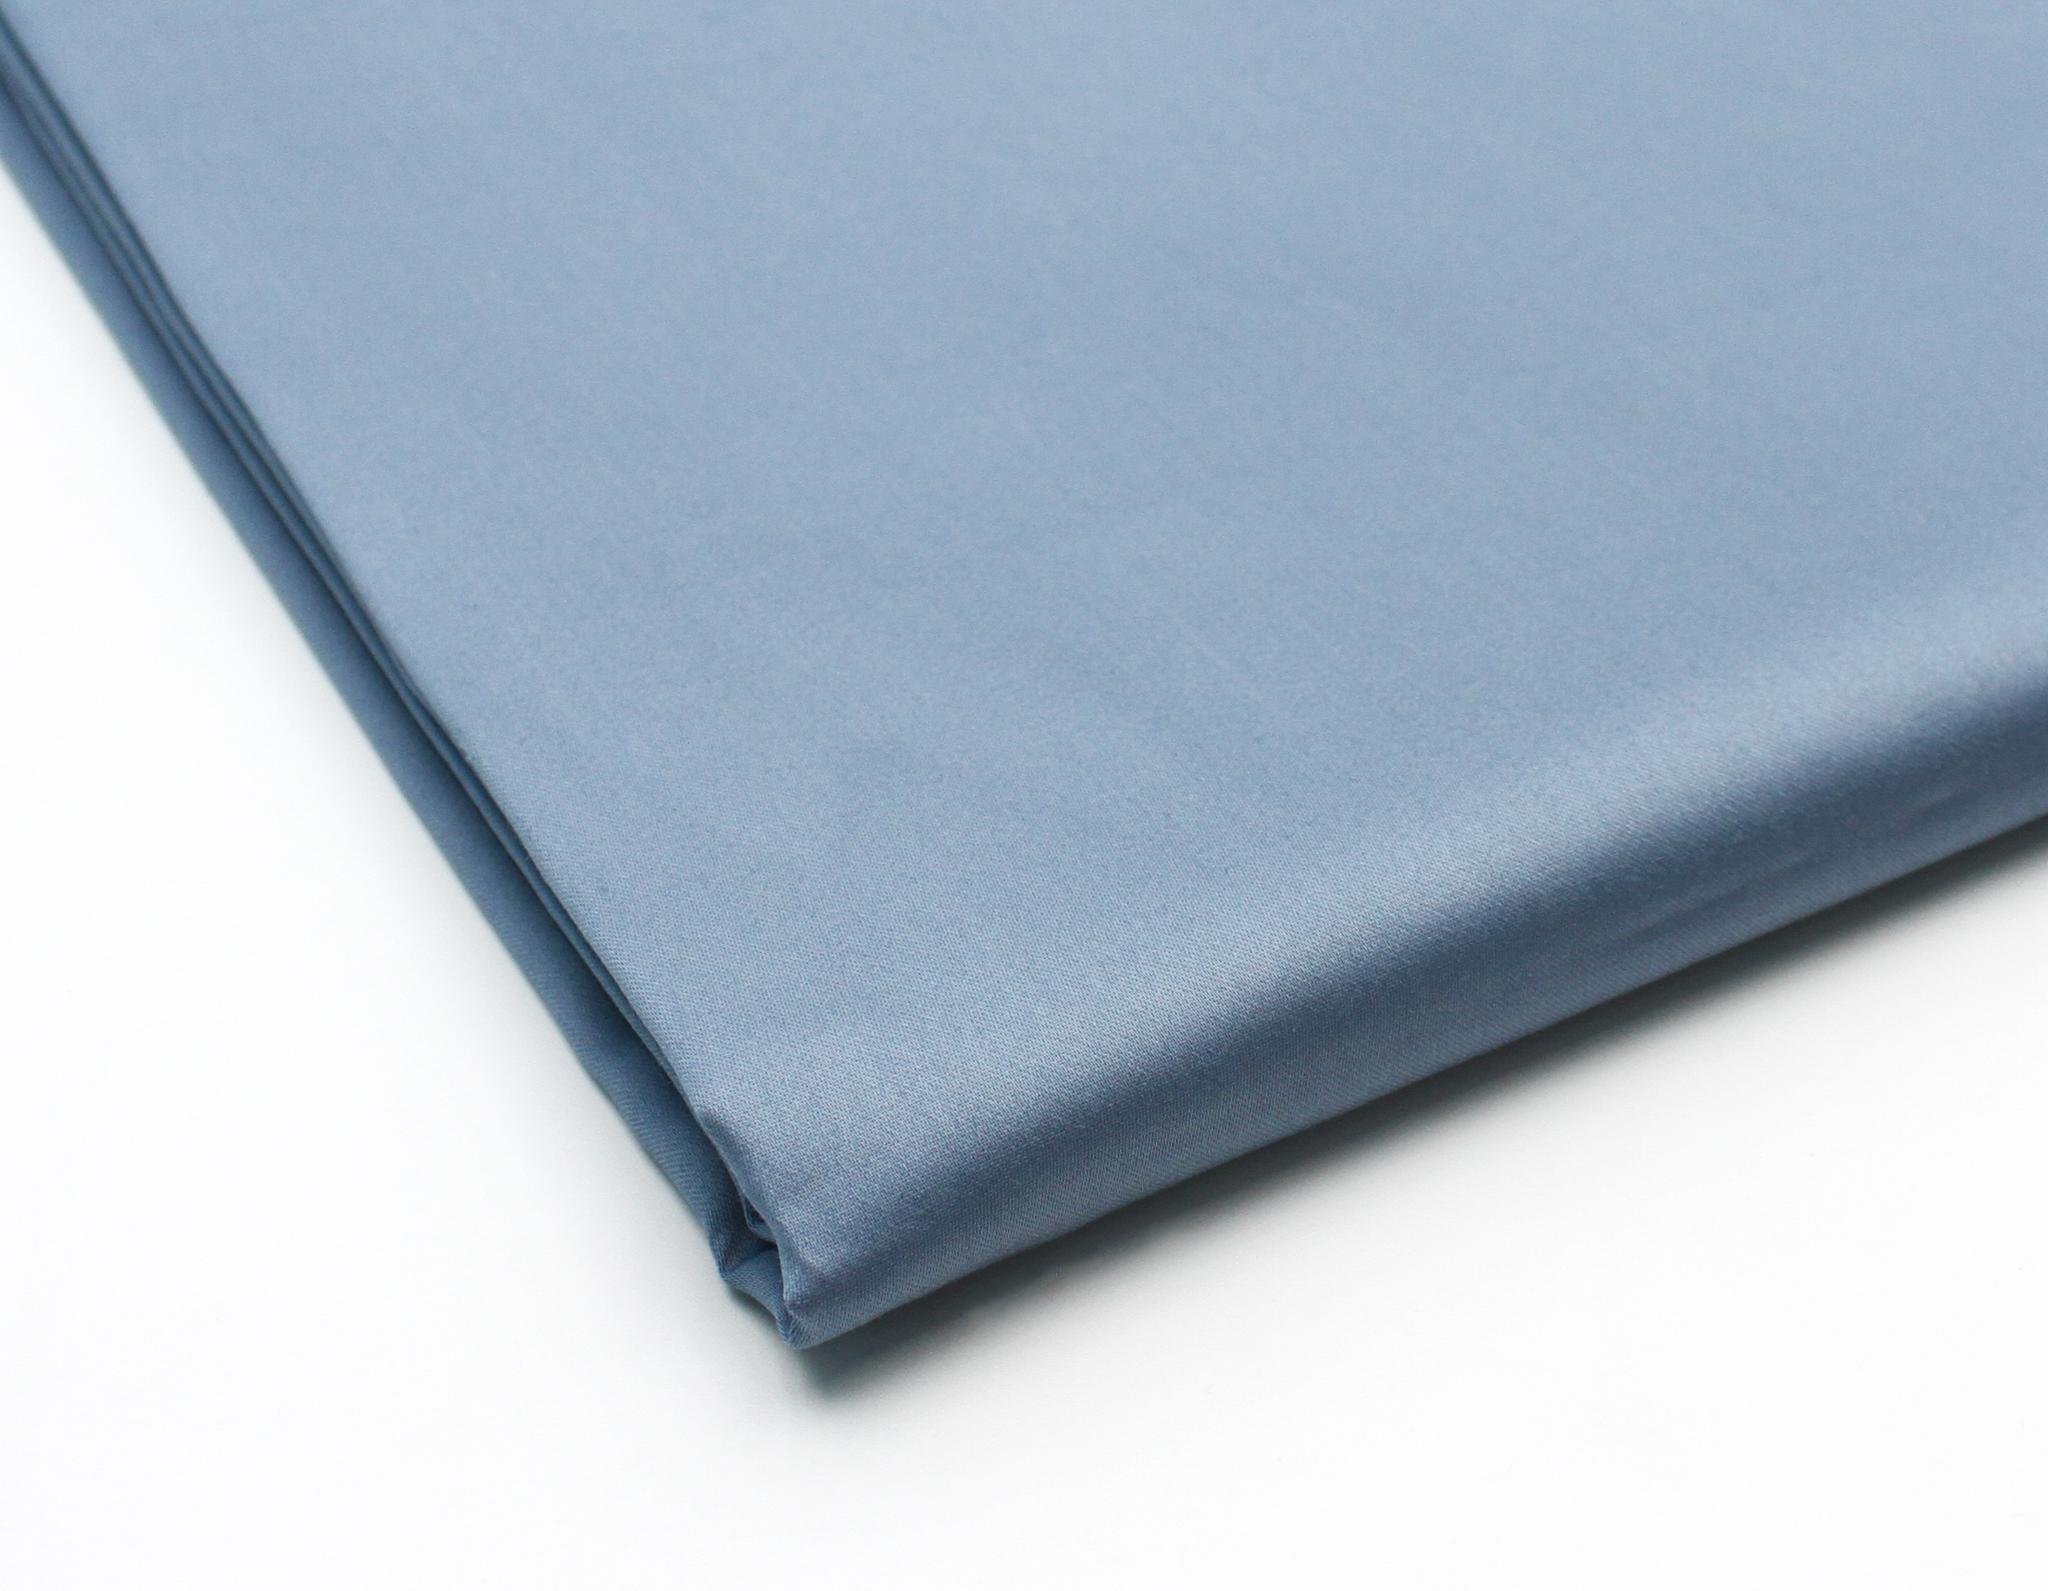 Дымчато-синий (сатин класса люкс,60s),250 см